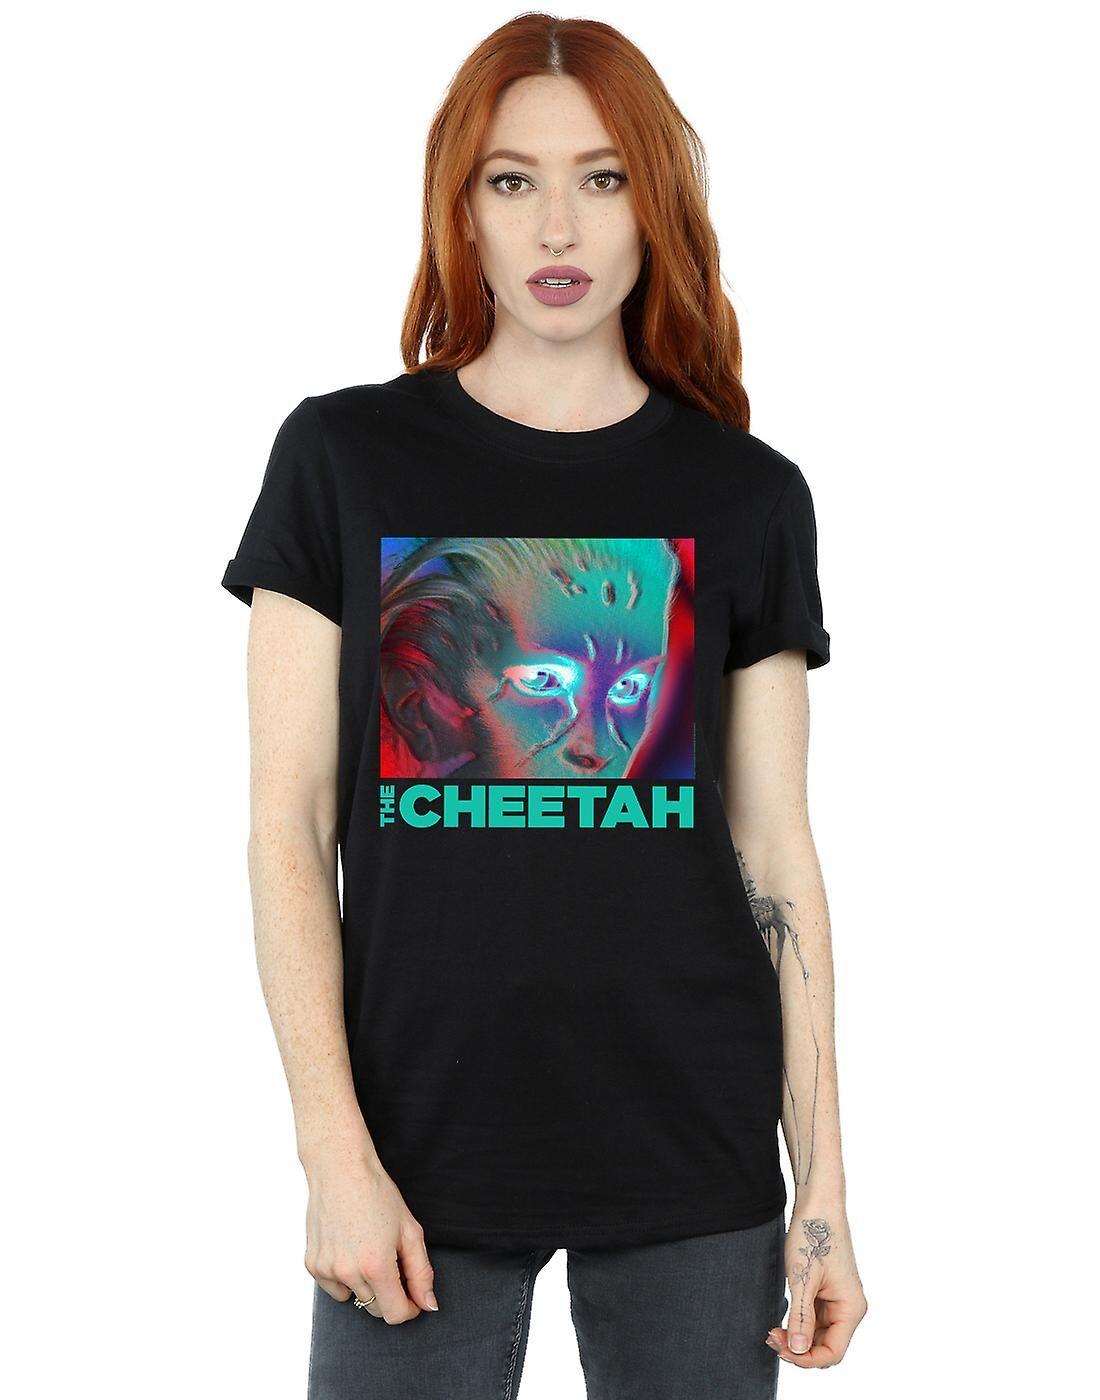 Absolute Cult DC Comics Femmes-apos;s Wonder Woman 84 Cheetah Face Boyfriend Fit T-Shirt Blanc XX-Large